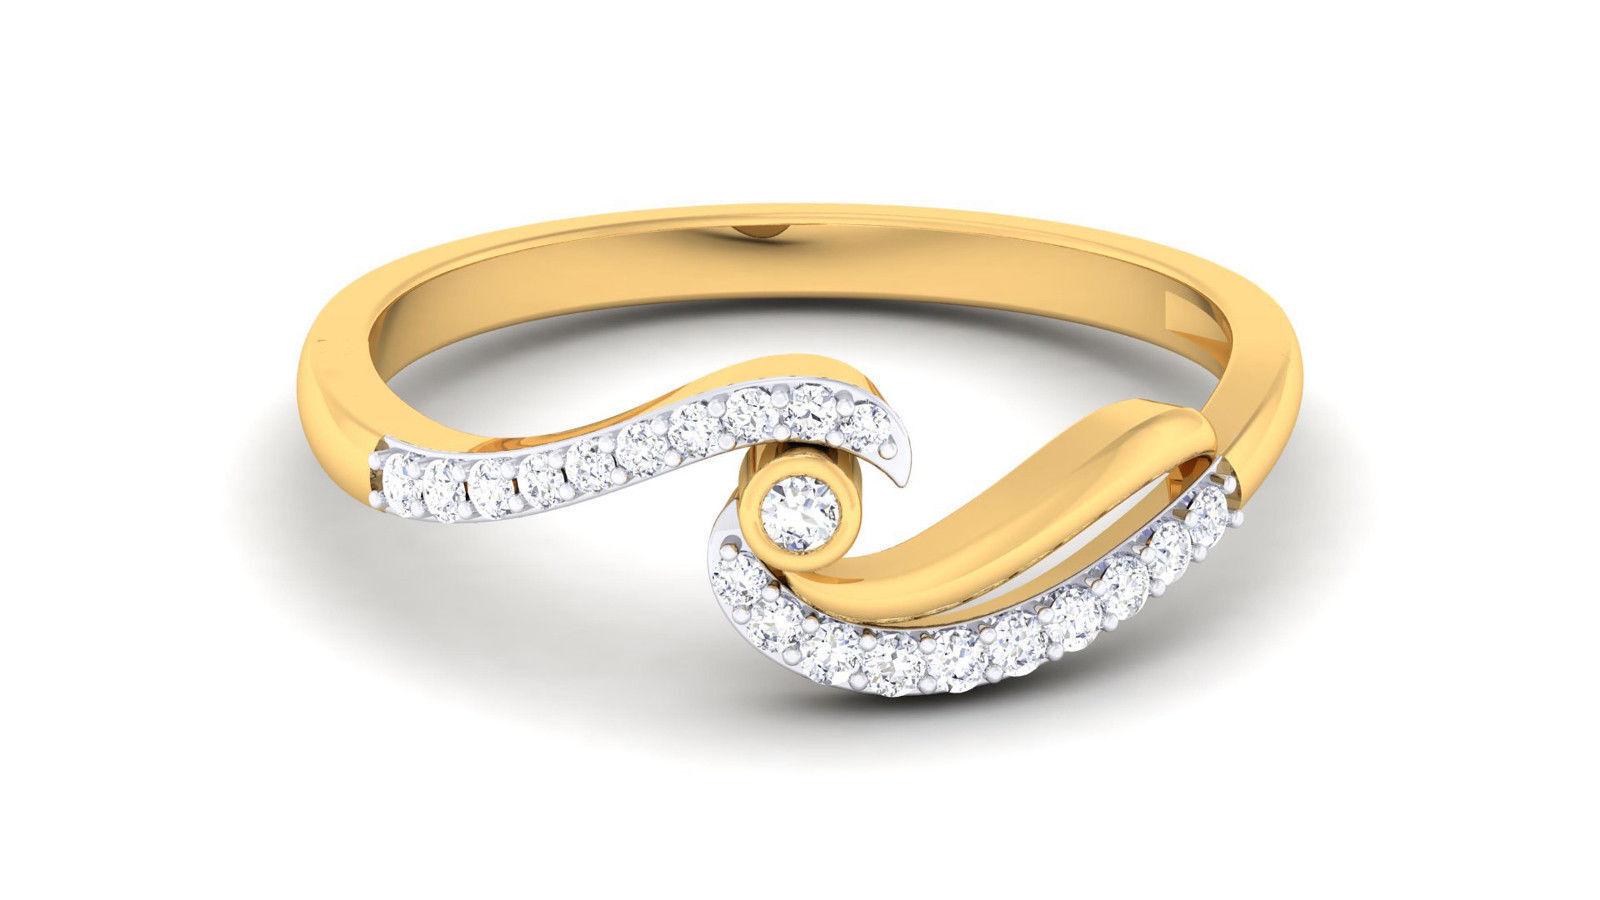 0.20 Cts Round Brilliant Cut Diamonds Anniversary Ring In Fine Hallmark 18K gold